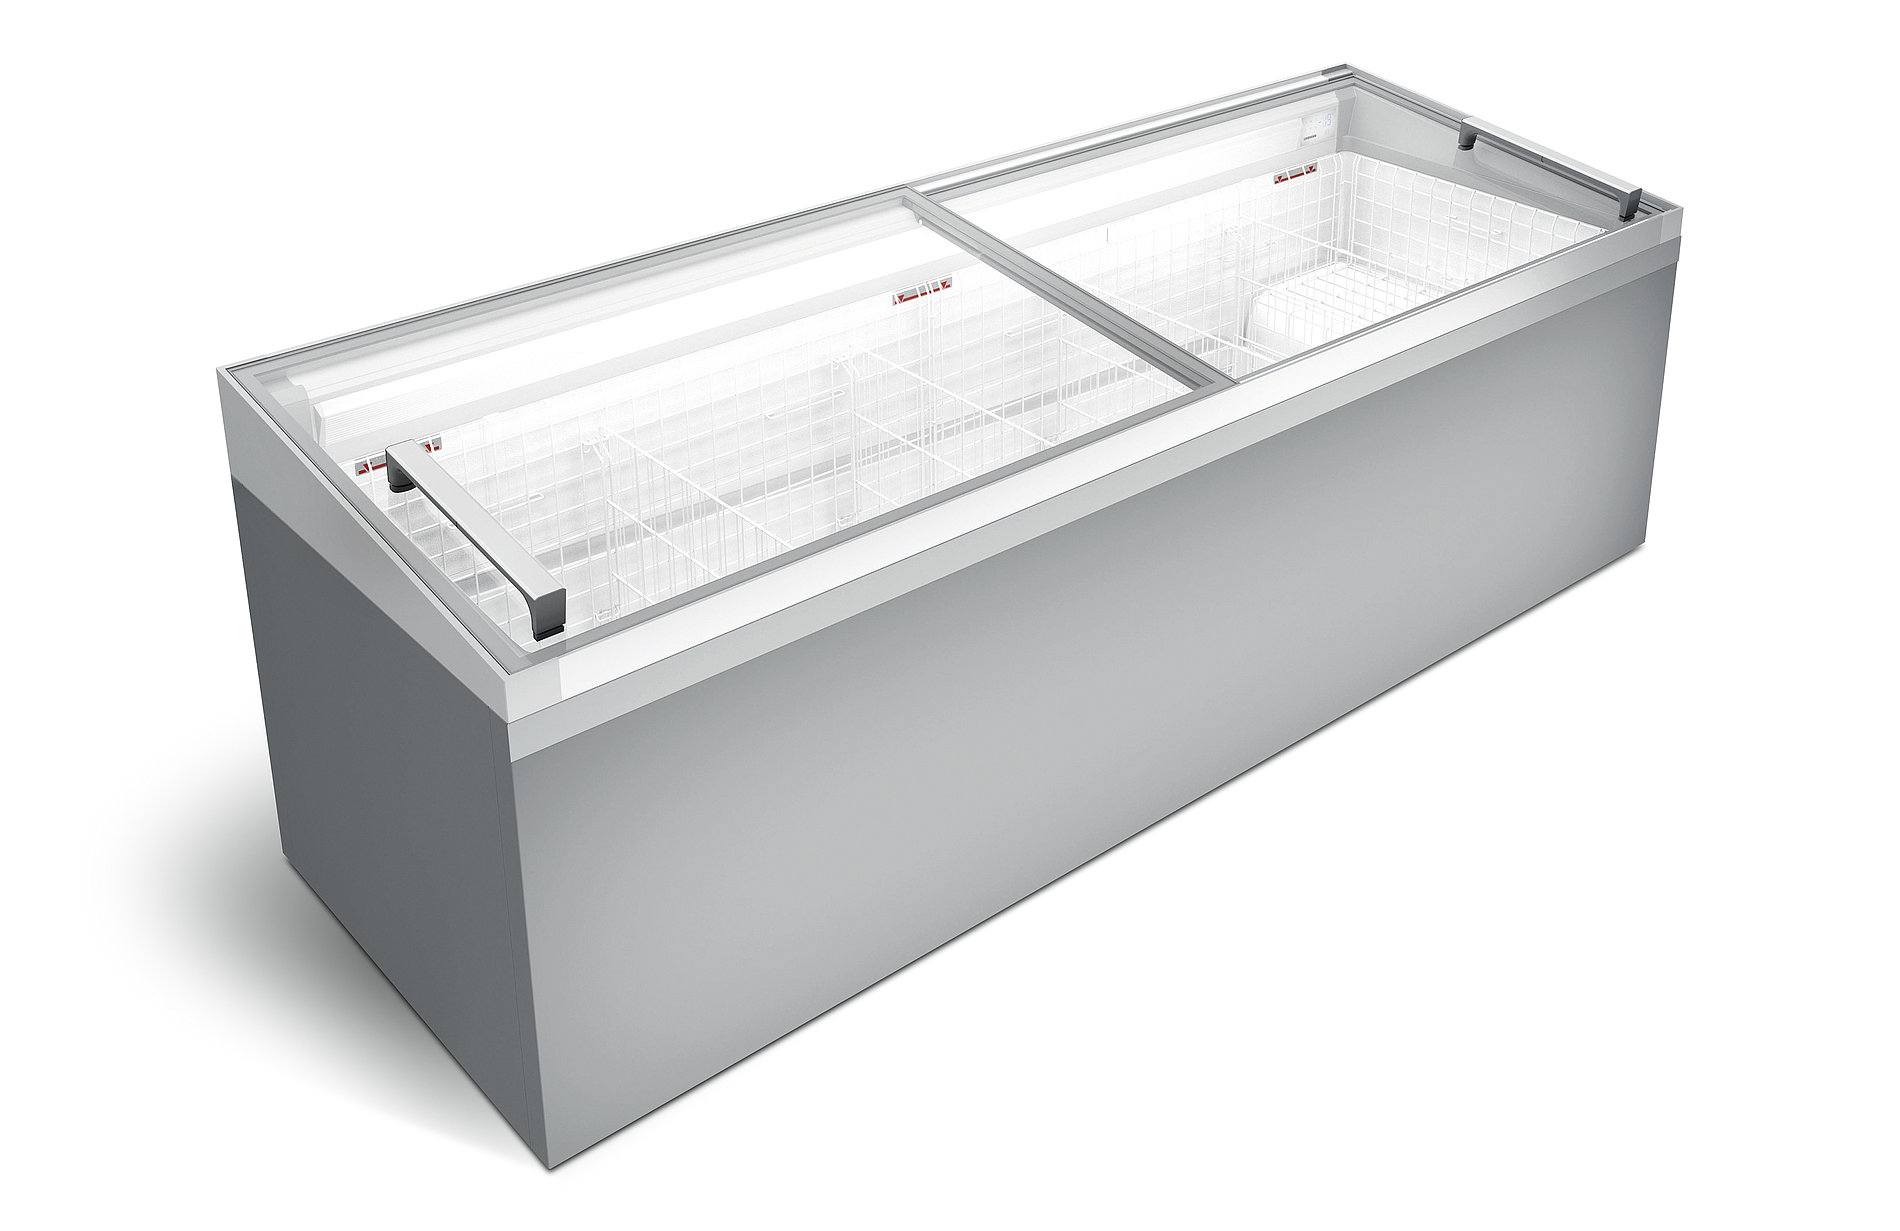 Supermarket Chiller and Freezer Product Range | Red Dot Design Award